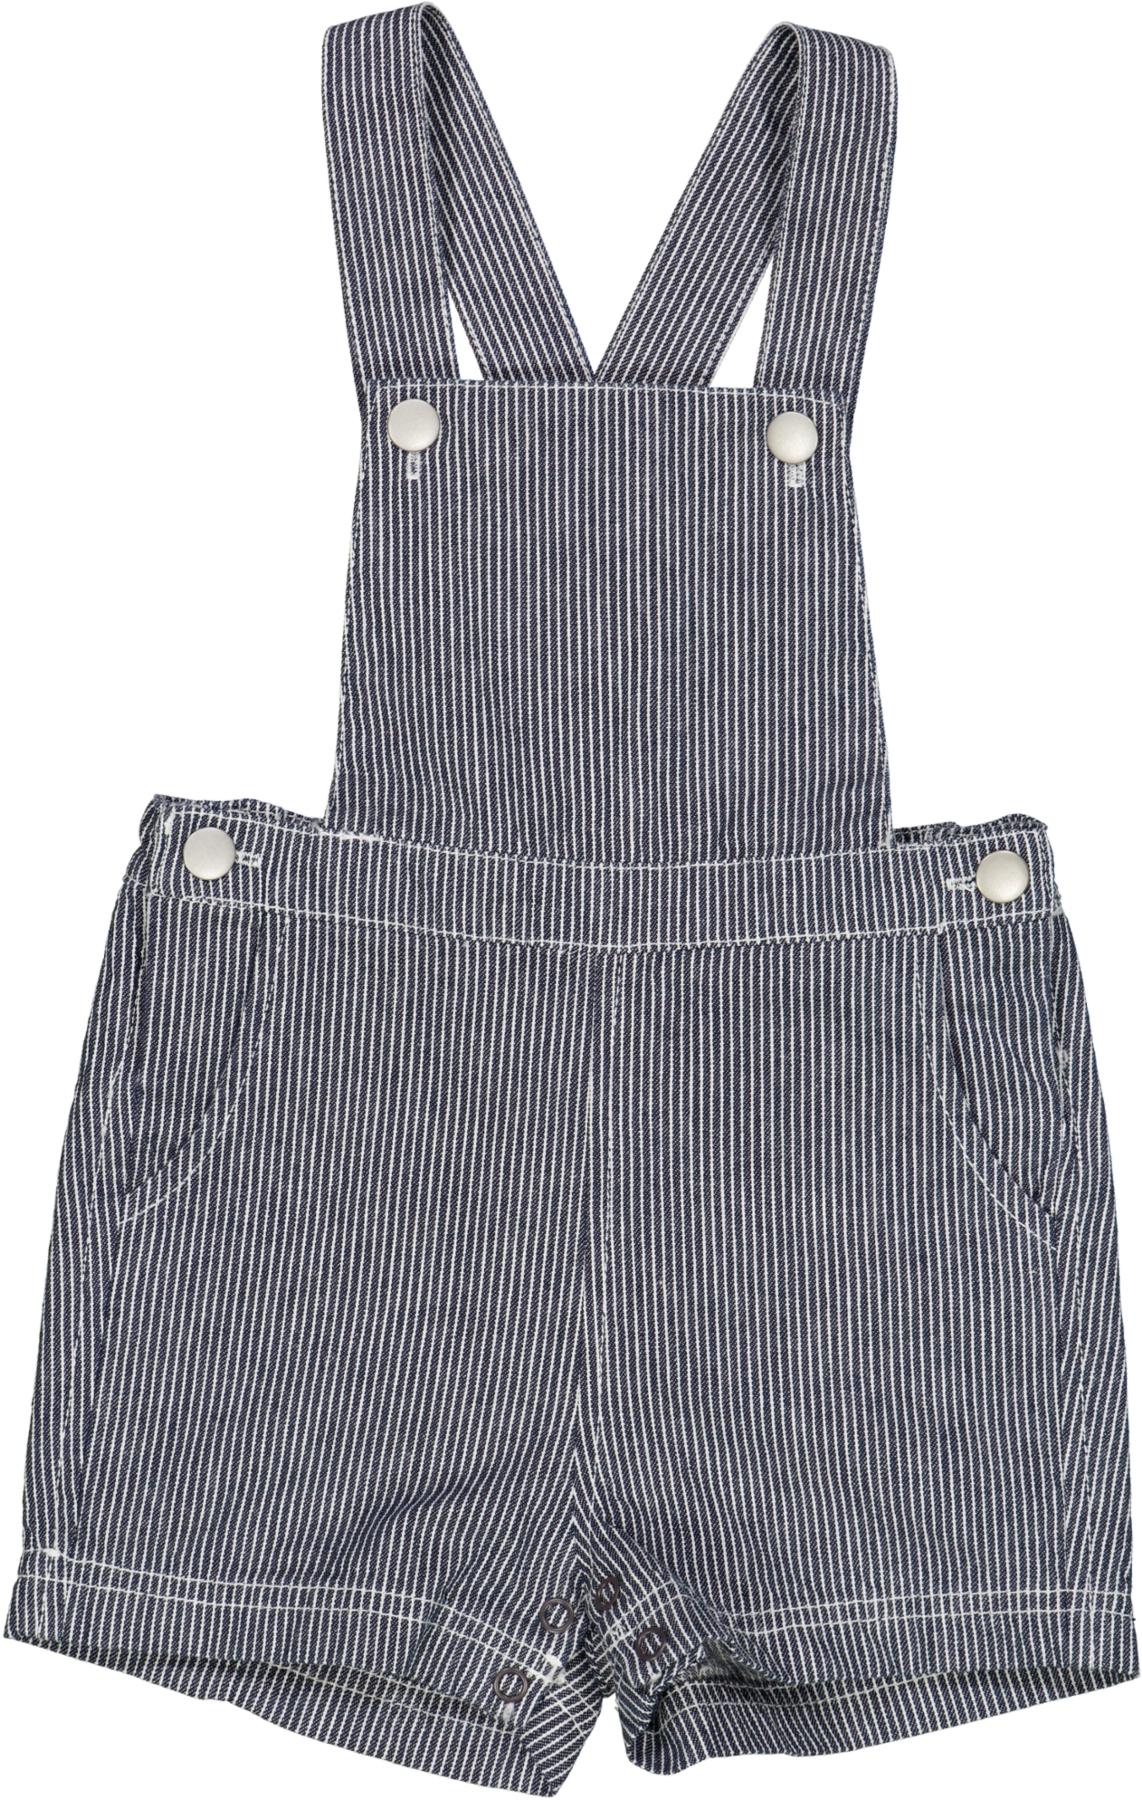 Wheat Erik overalls